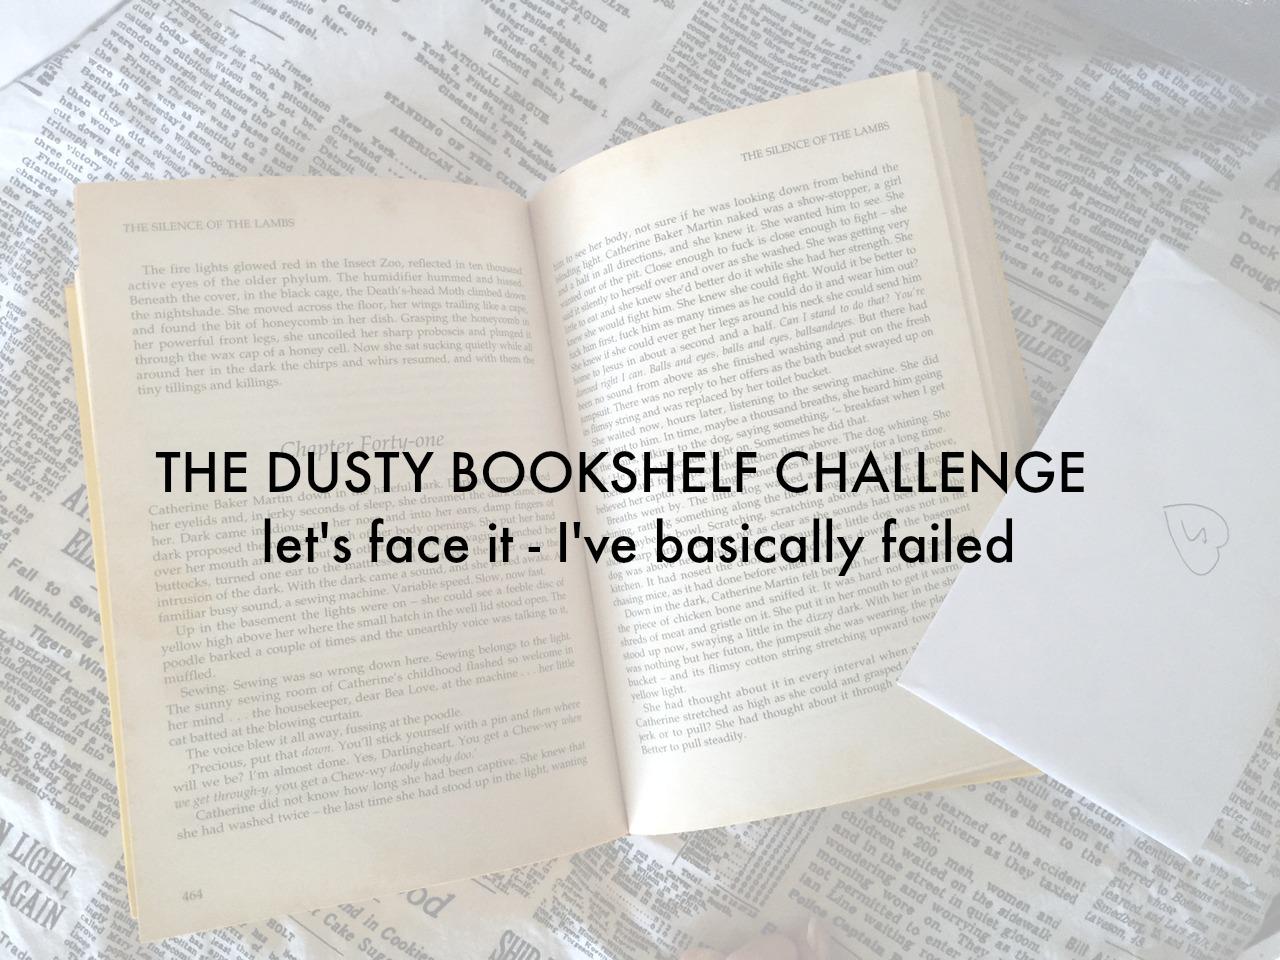 the dusty bookshelf challenge